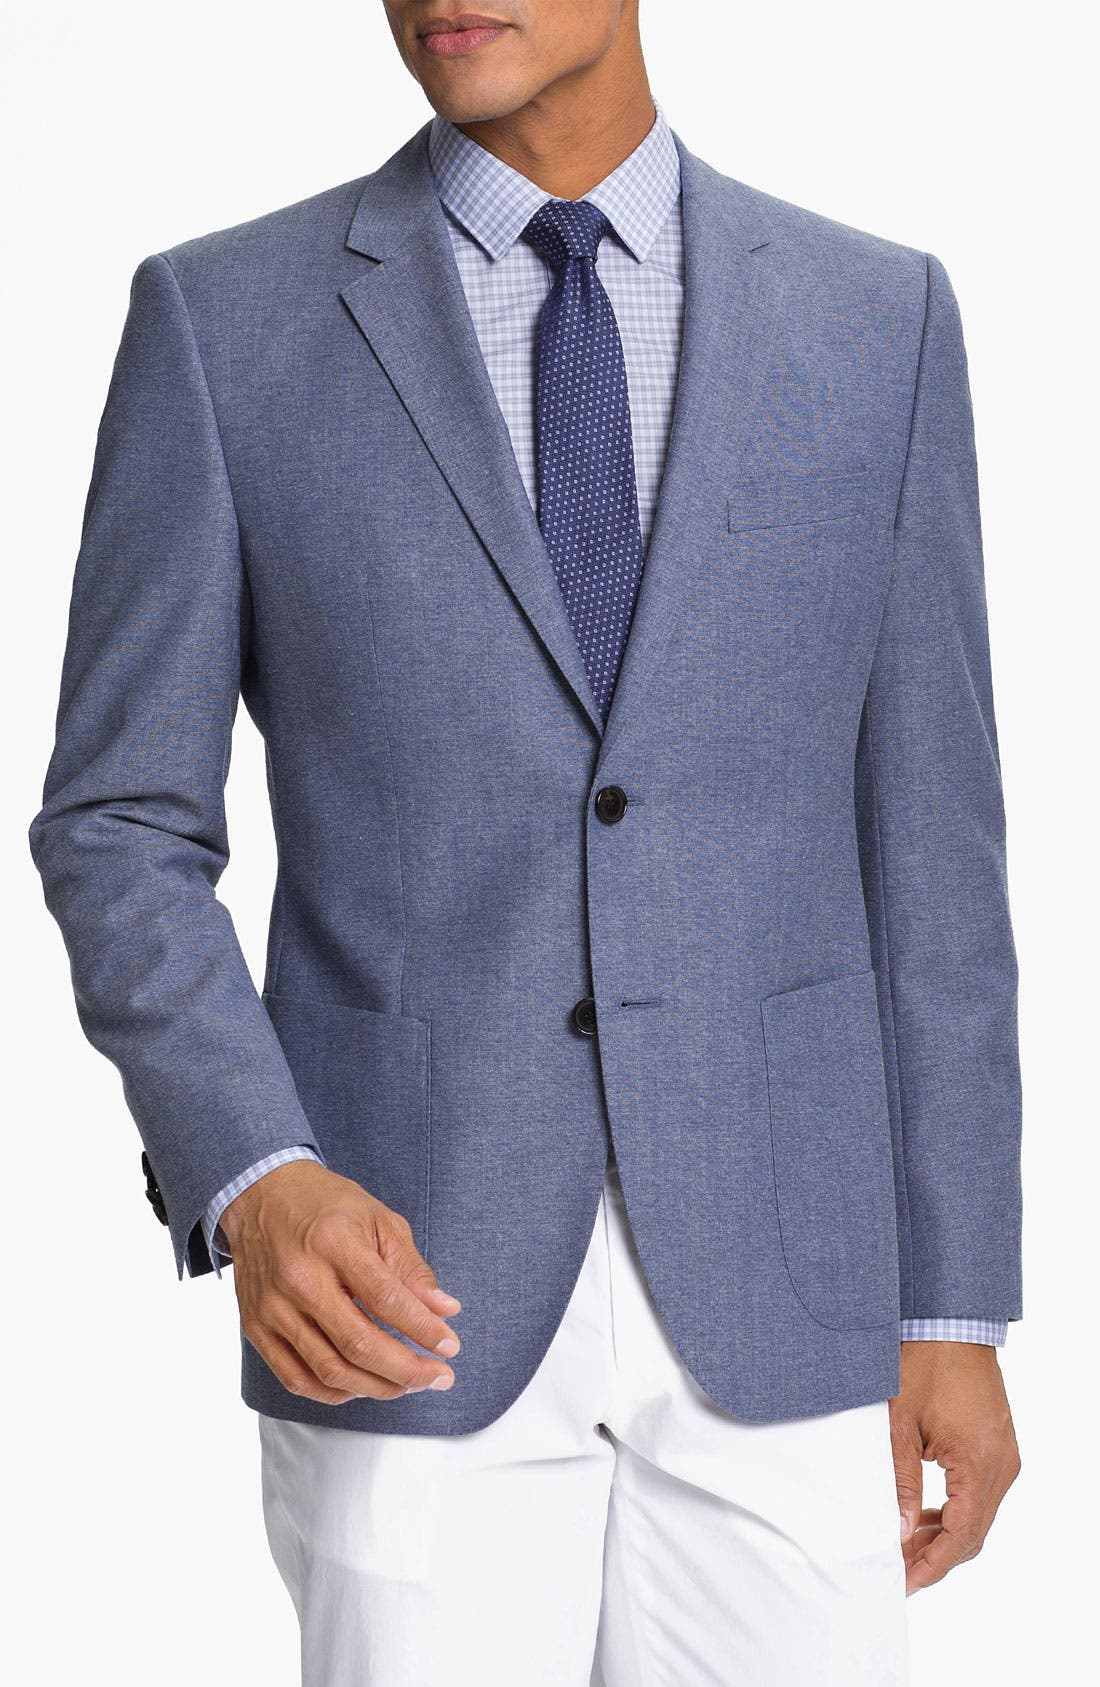 Alternate Image 1 Selected - BOSS HUGO BOSS 'Jesse' Trim Fit Cotton Blend Blazer